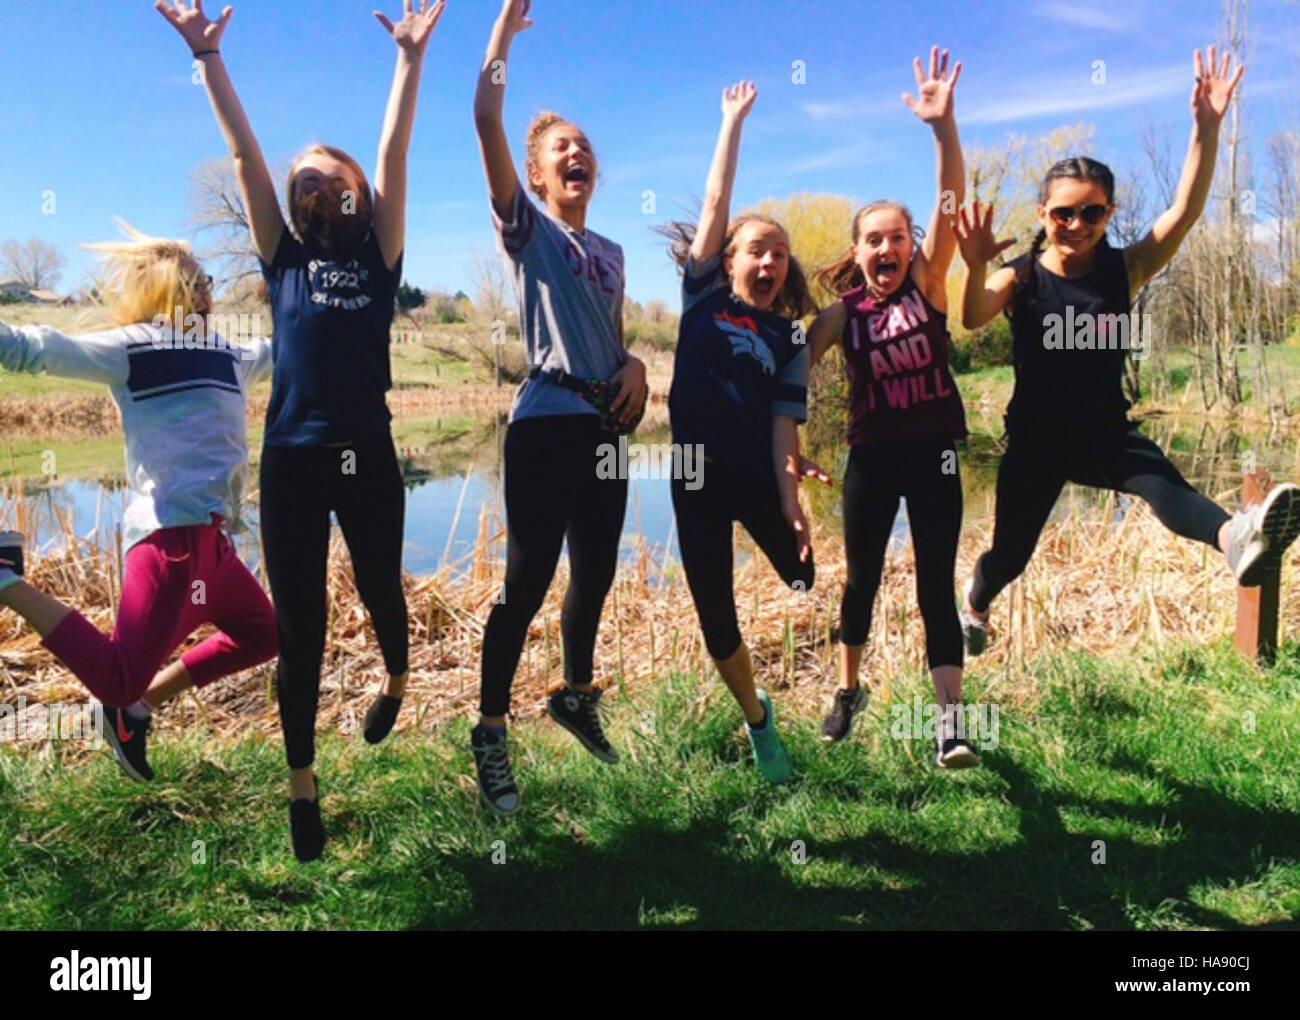 usfwsmtnprairie 26550248832 Earth Day - 2016 - Stock Image